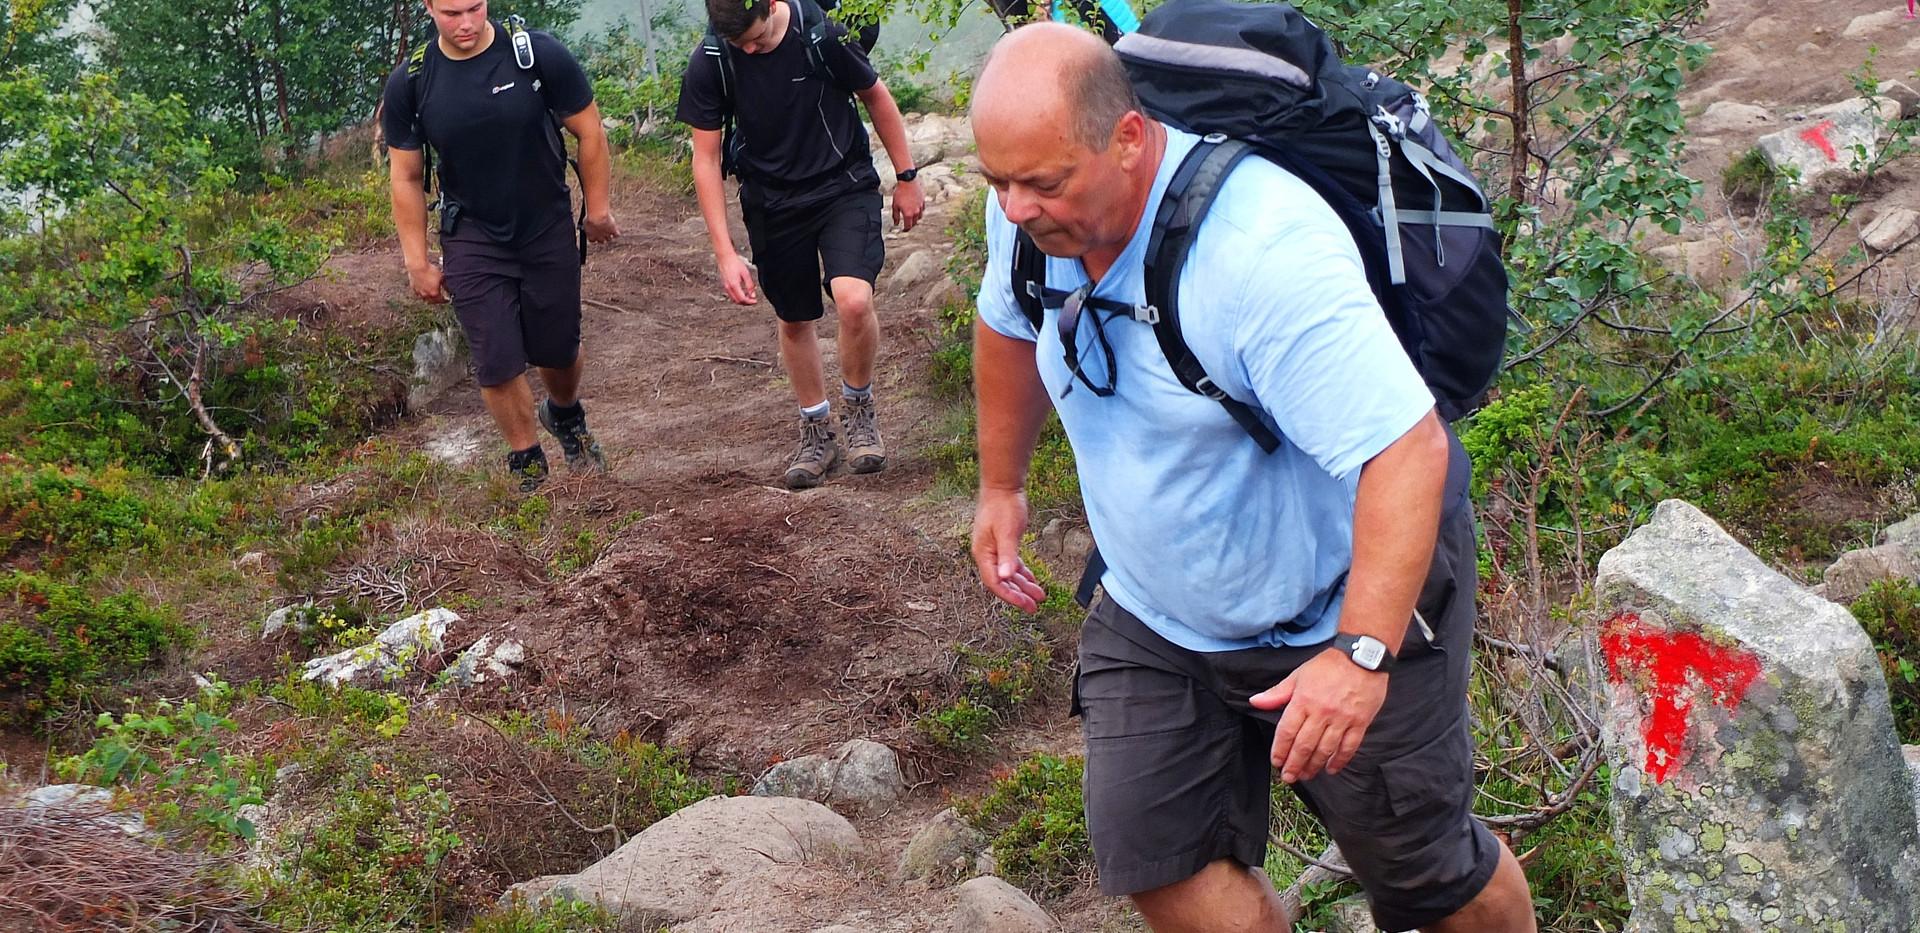 Carl enjoying his hike part way up! Gym   Fitness   Weight Loss   Personal Trainer   Fitness Training   Health   Harlow   Bishops Stortford   Sawbridgeworth   Hiking